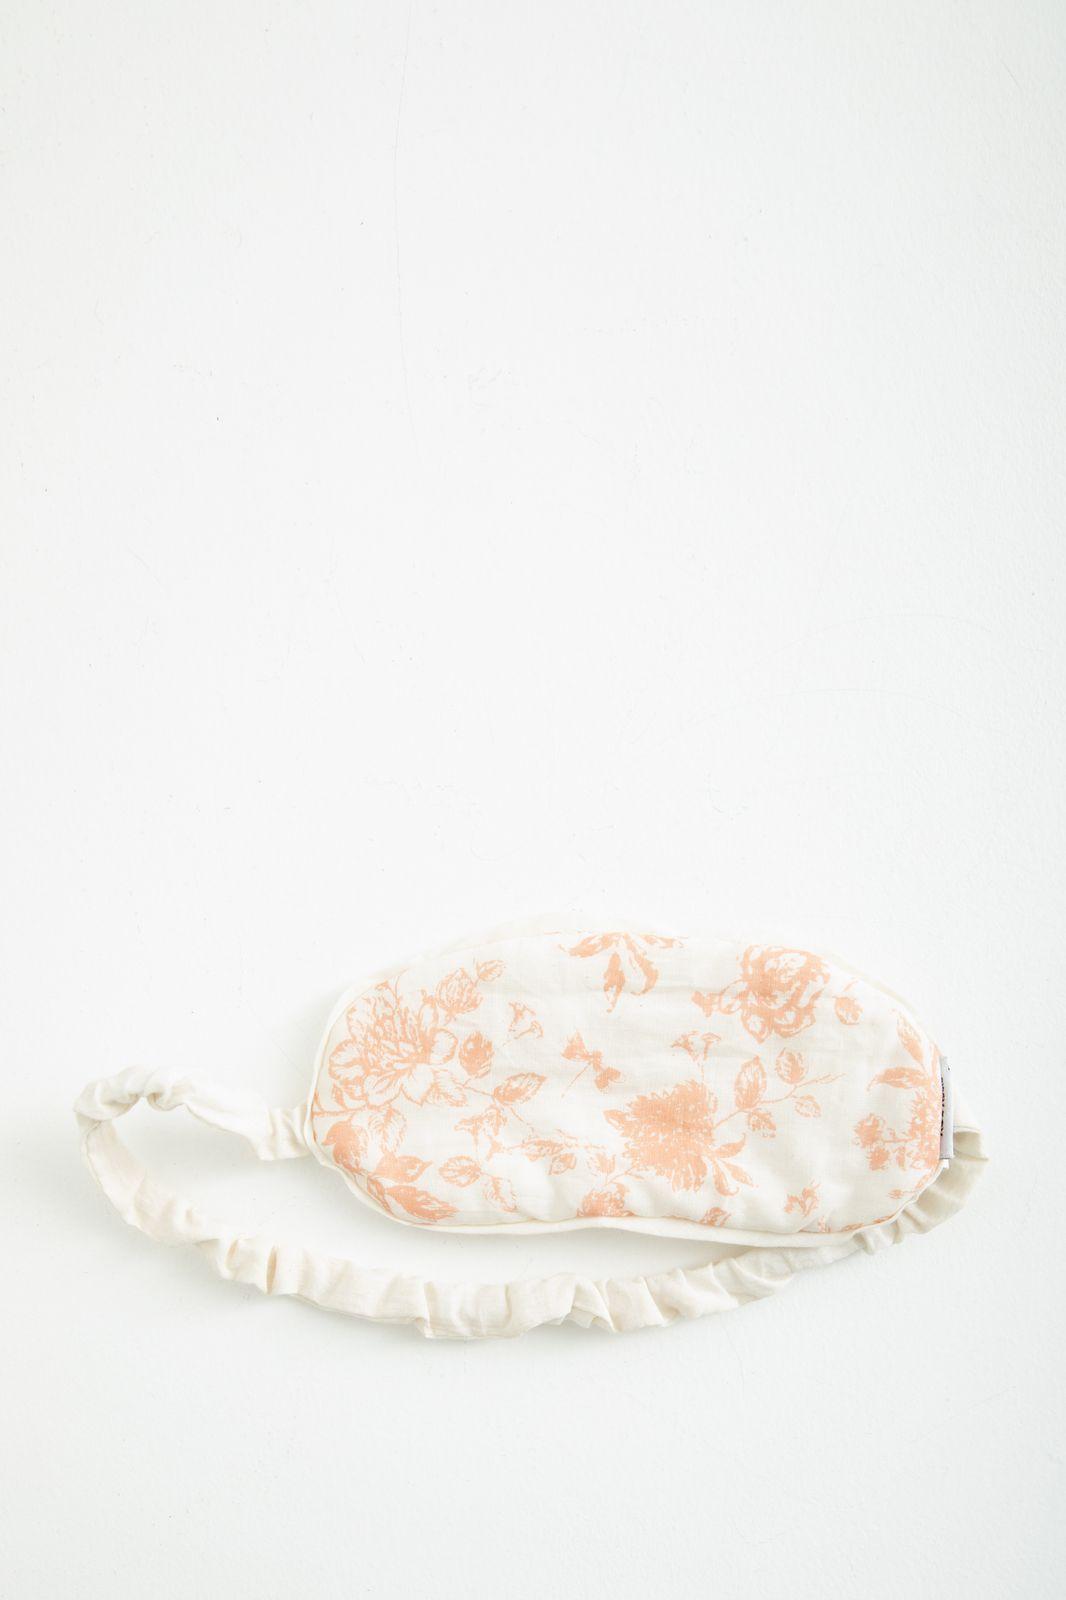 Oranje slaapmaskertje met bloemenprint - Homeland | Sissy-Boy